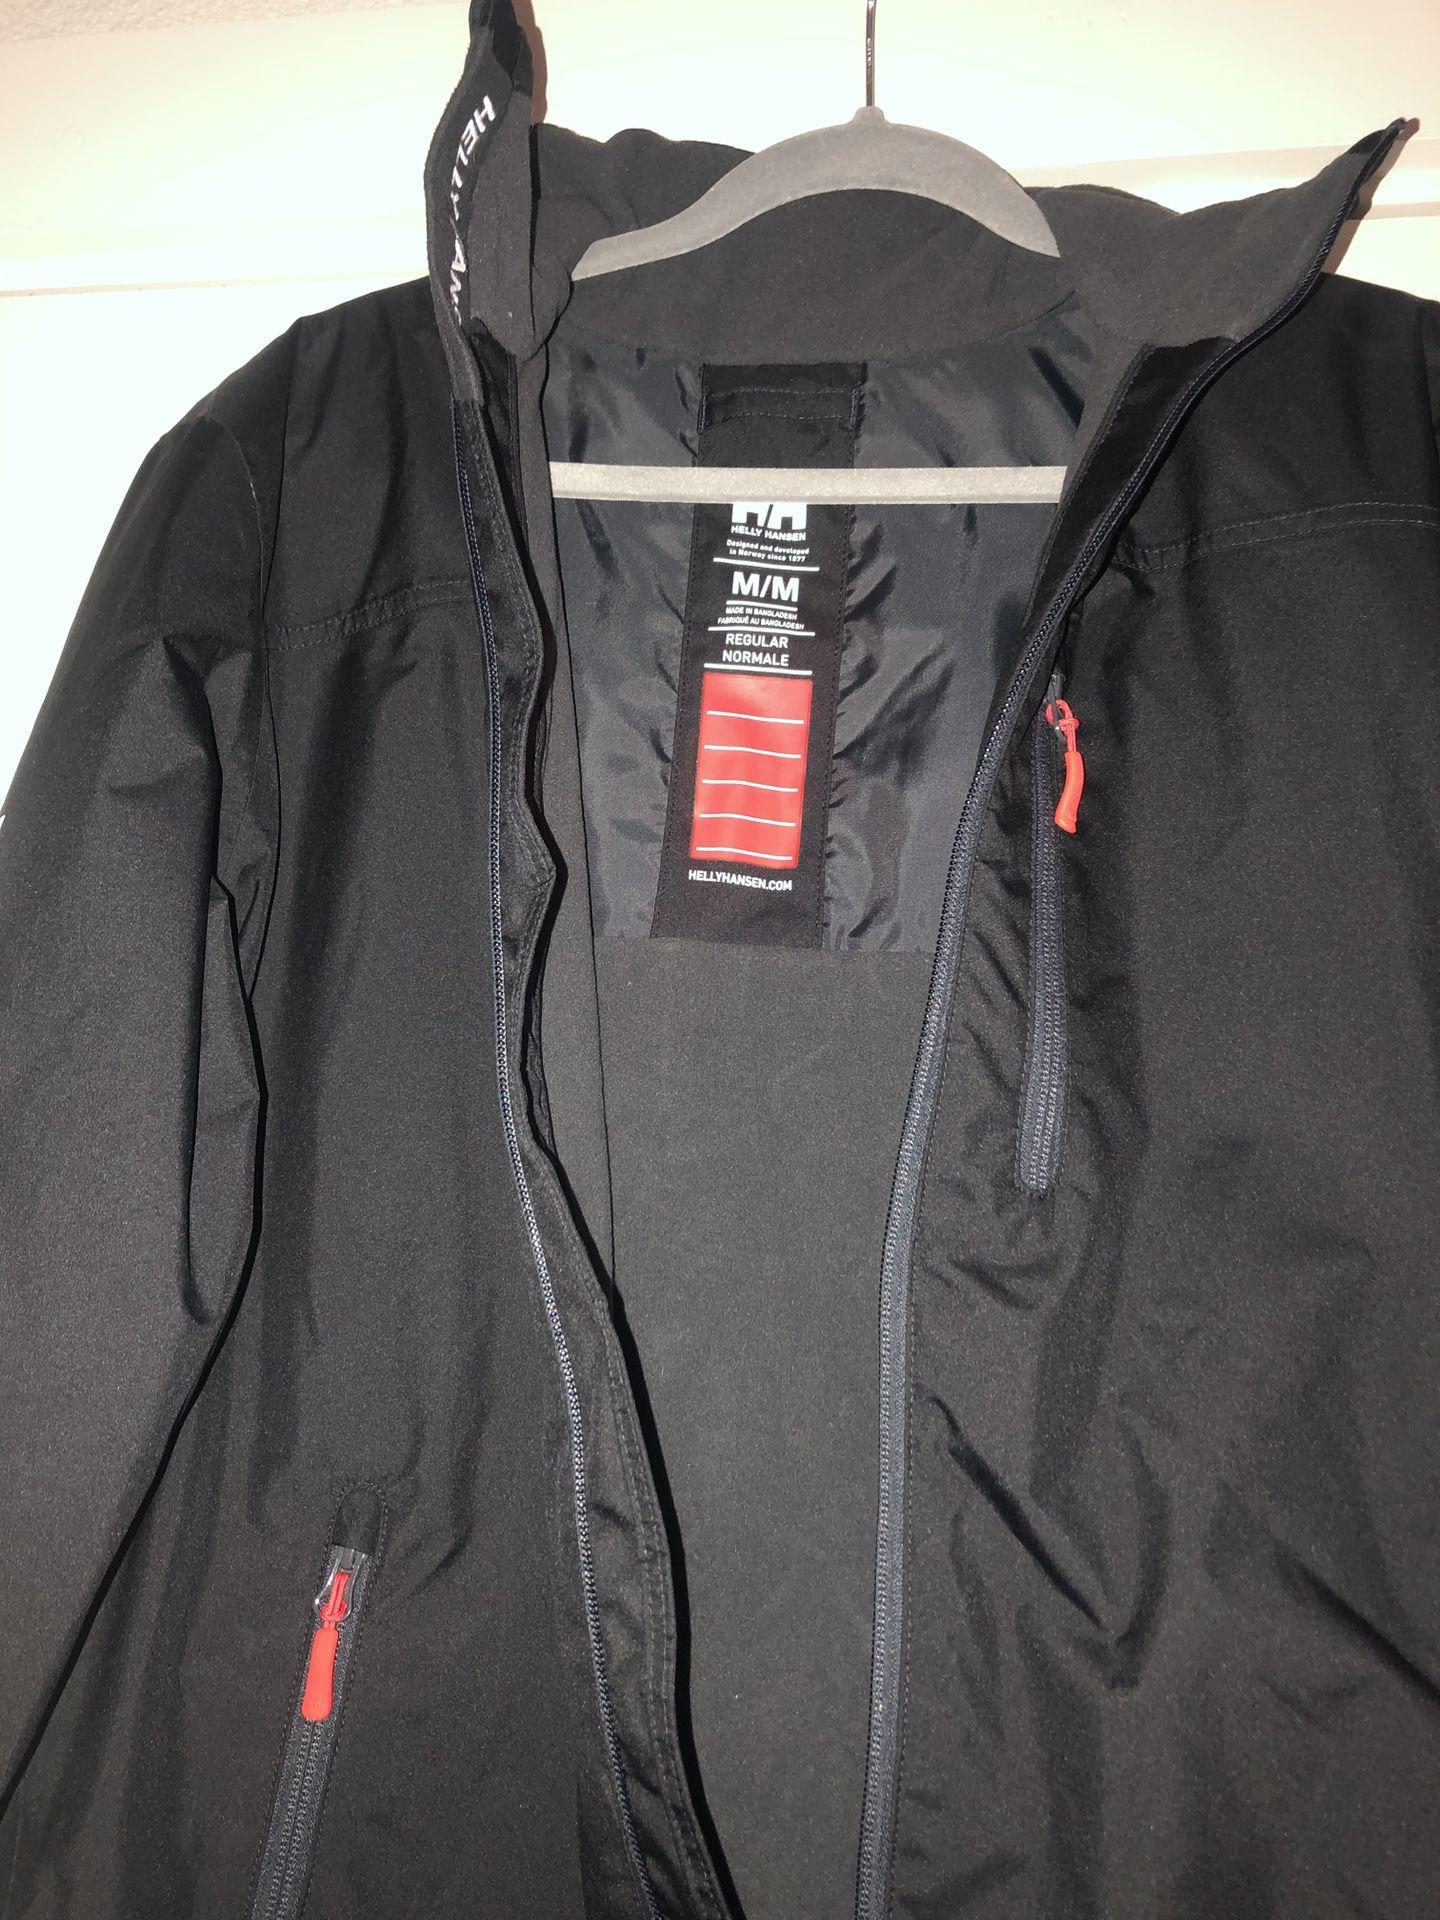 Helly Hansen Crew Mid layer Fleece Lined Waterproof Jacket/ Size M